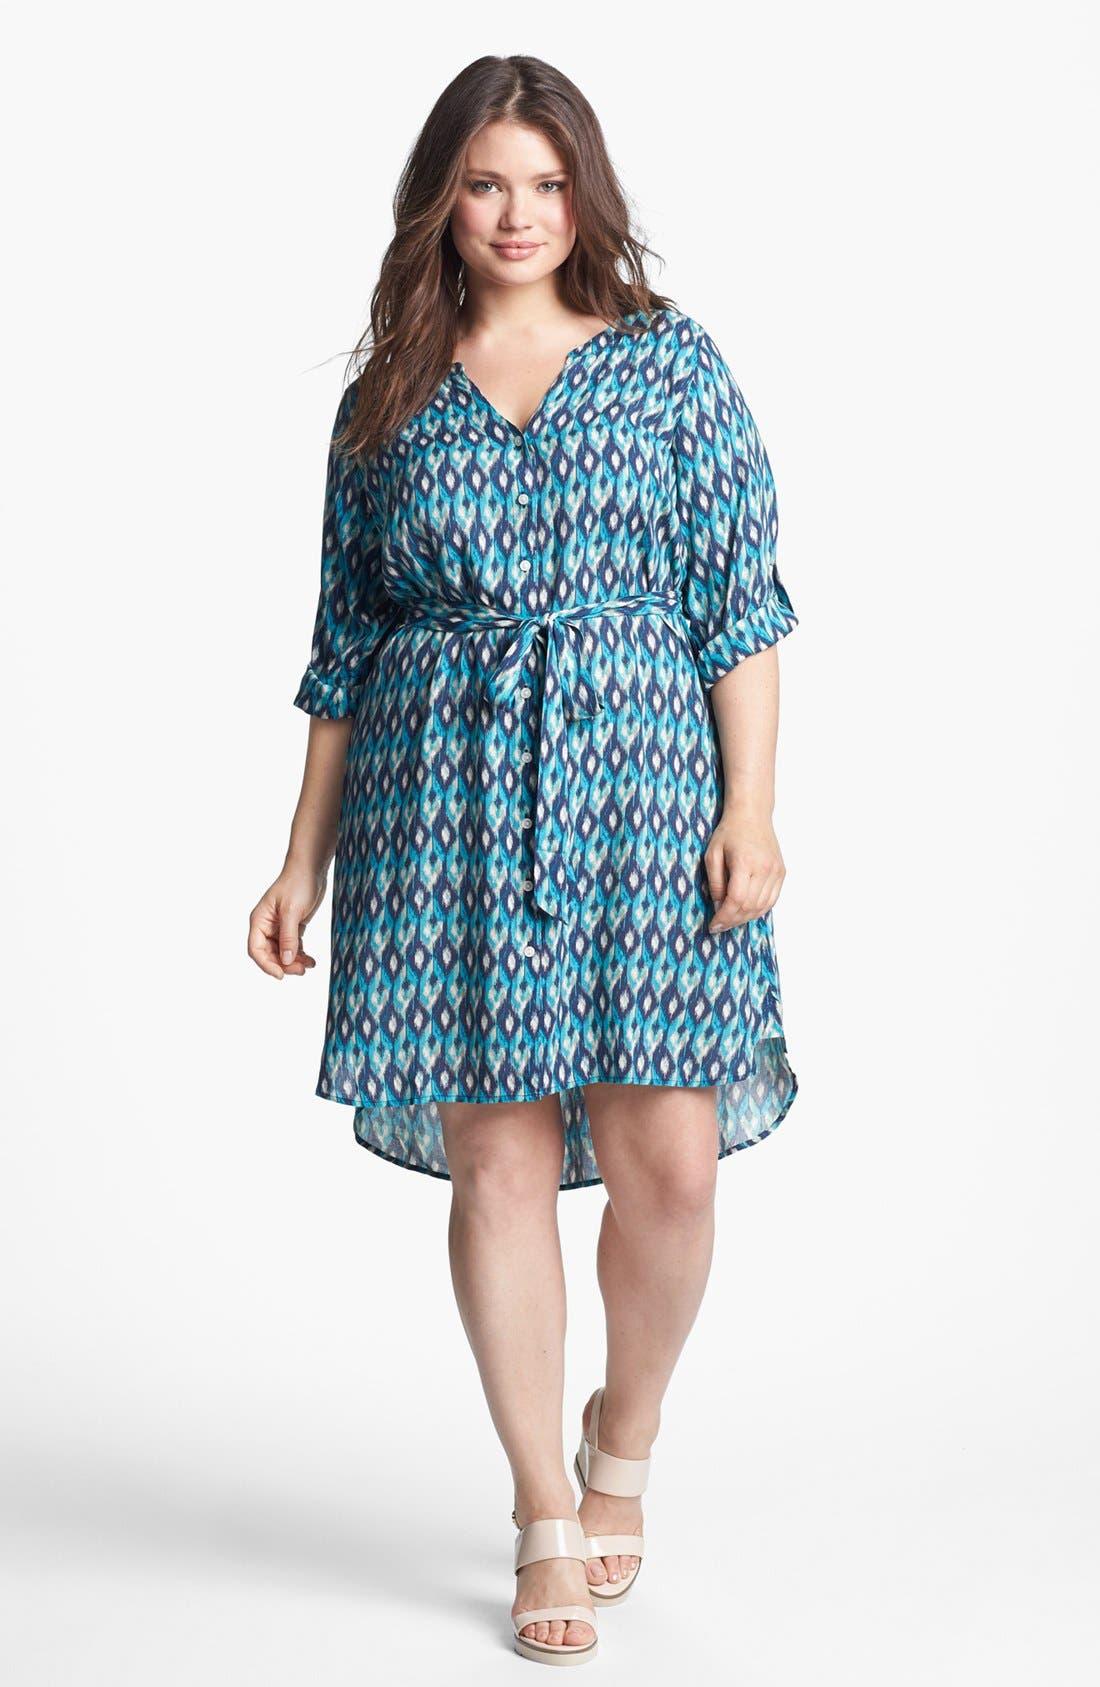 Alternate Image 1 Selected - Lucky Brand 'Vailea' Print Shirtdress (Plus Size)